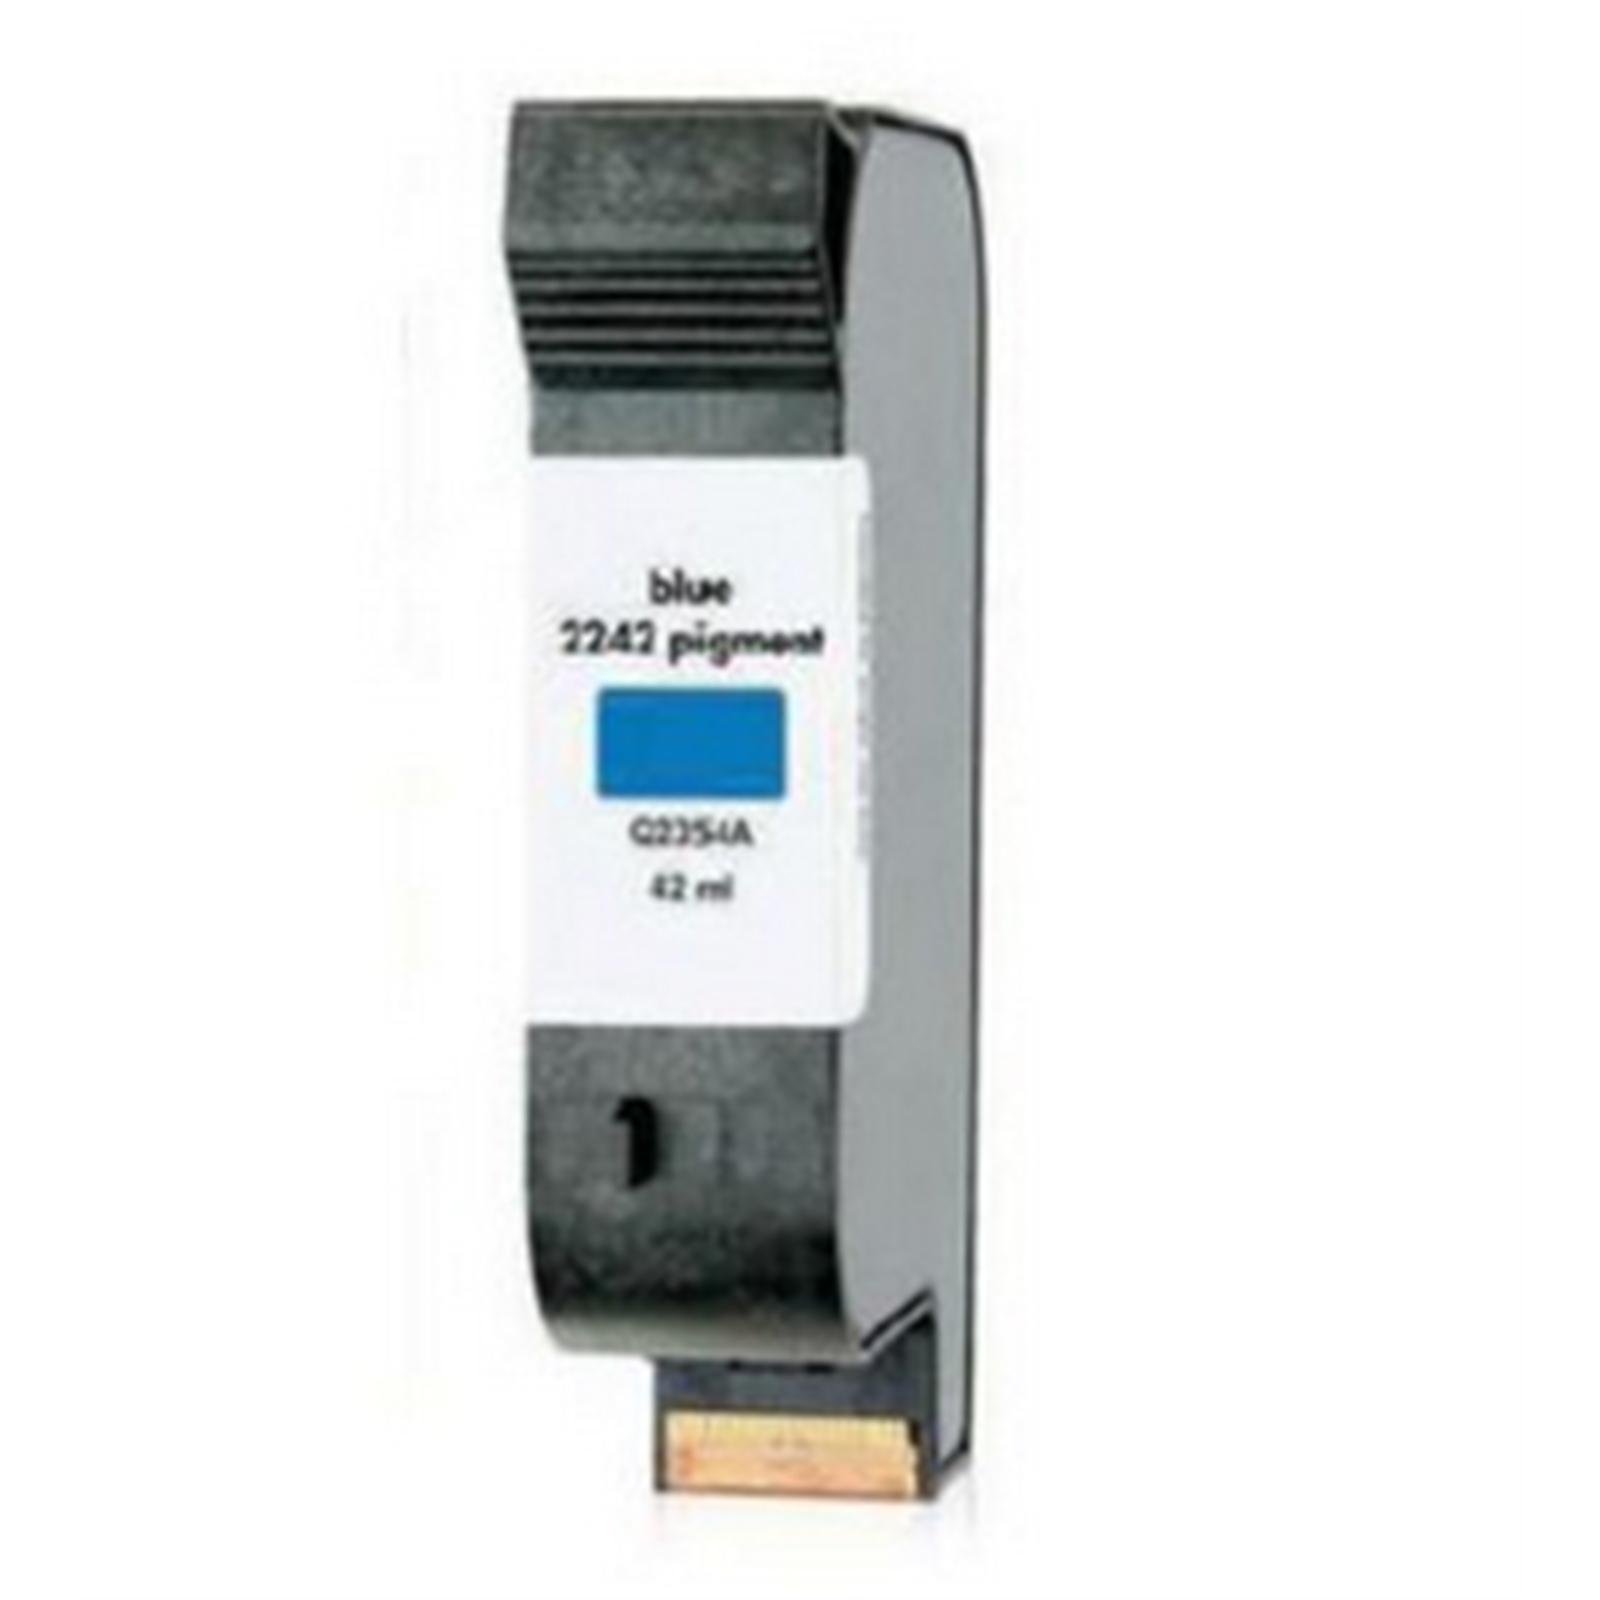 Hewlett Packard Inkjet Cartridges Q2354a Servers Plus